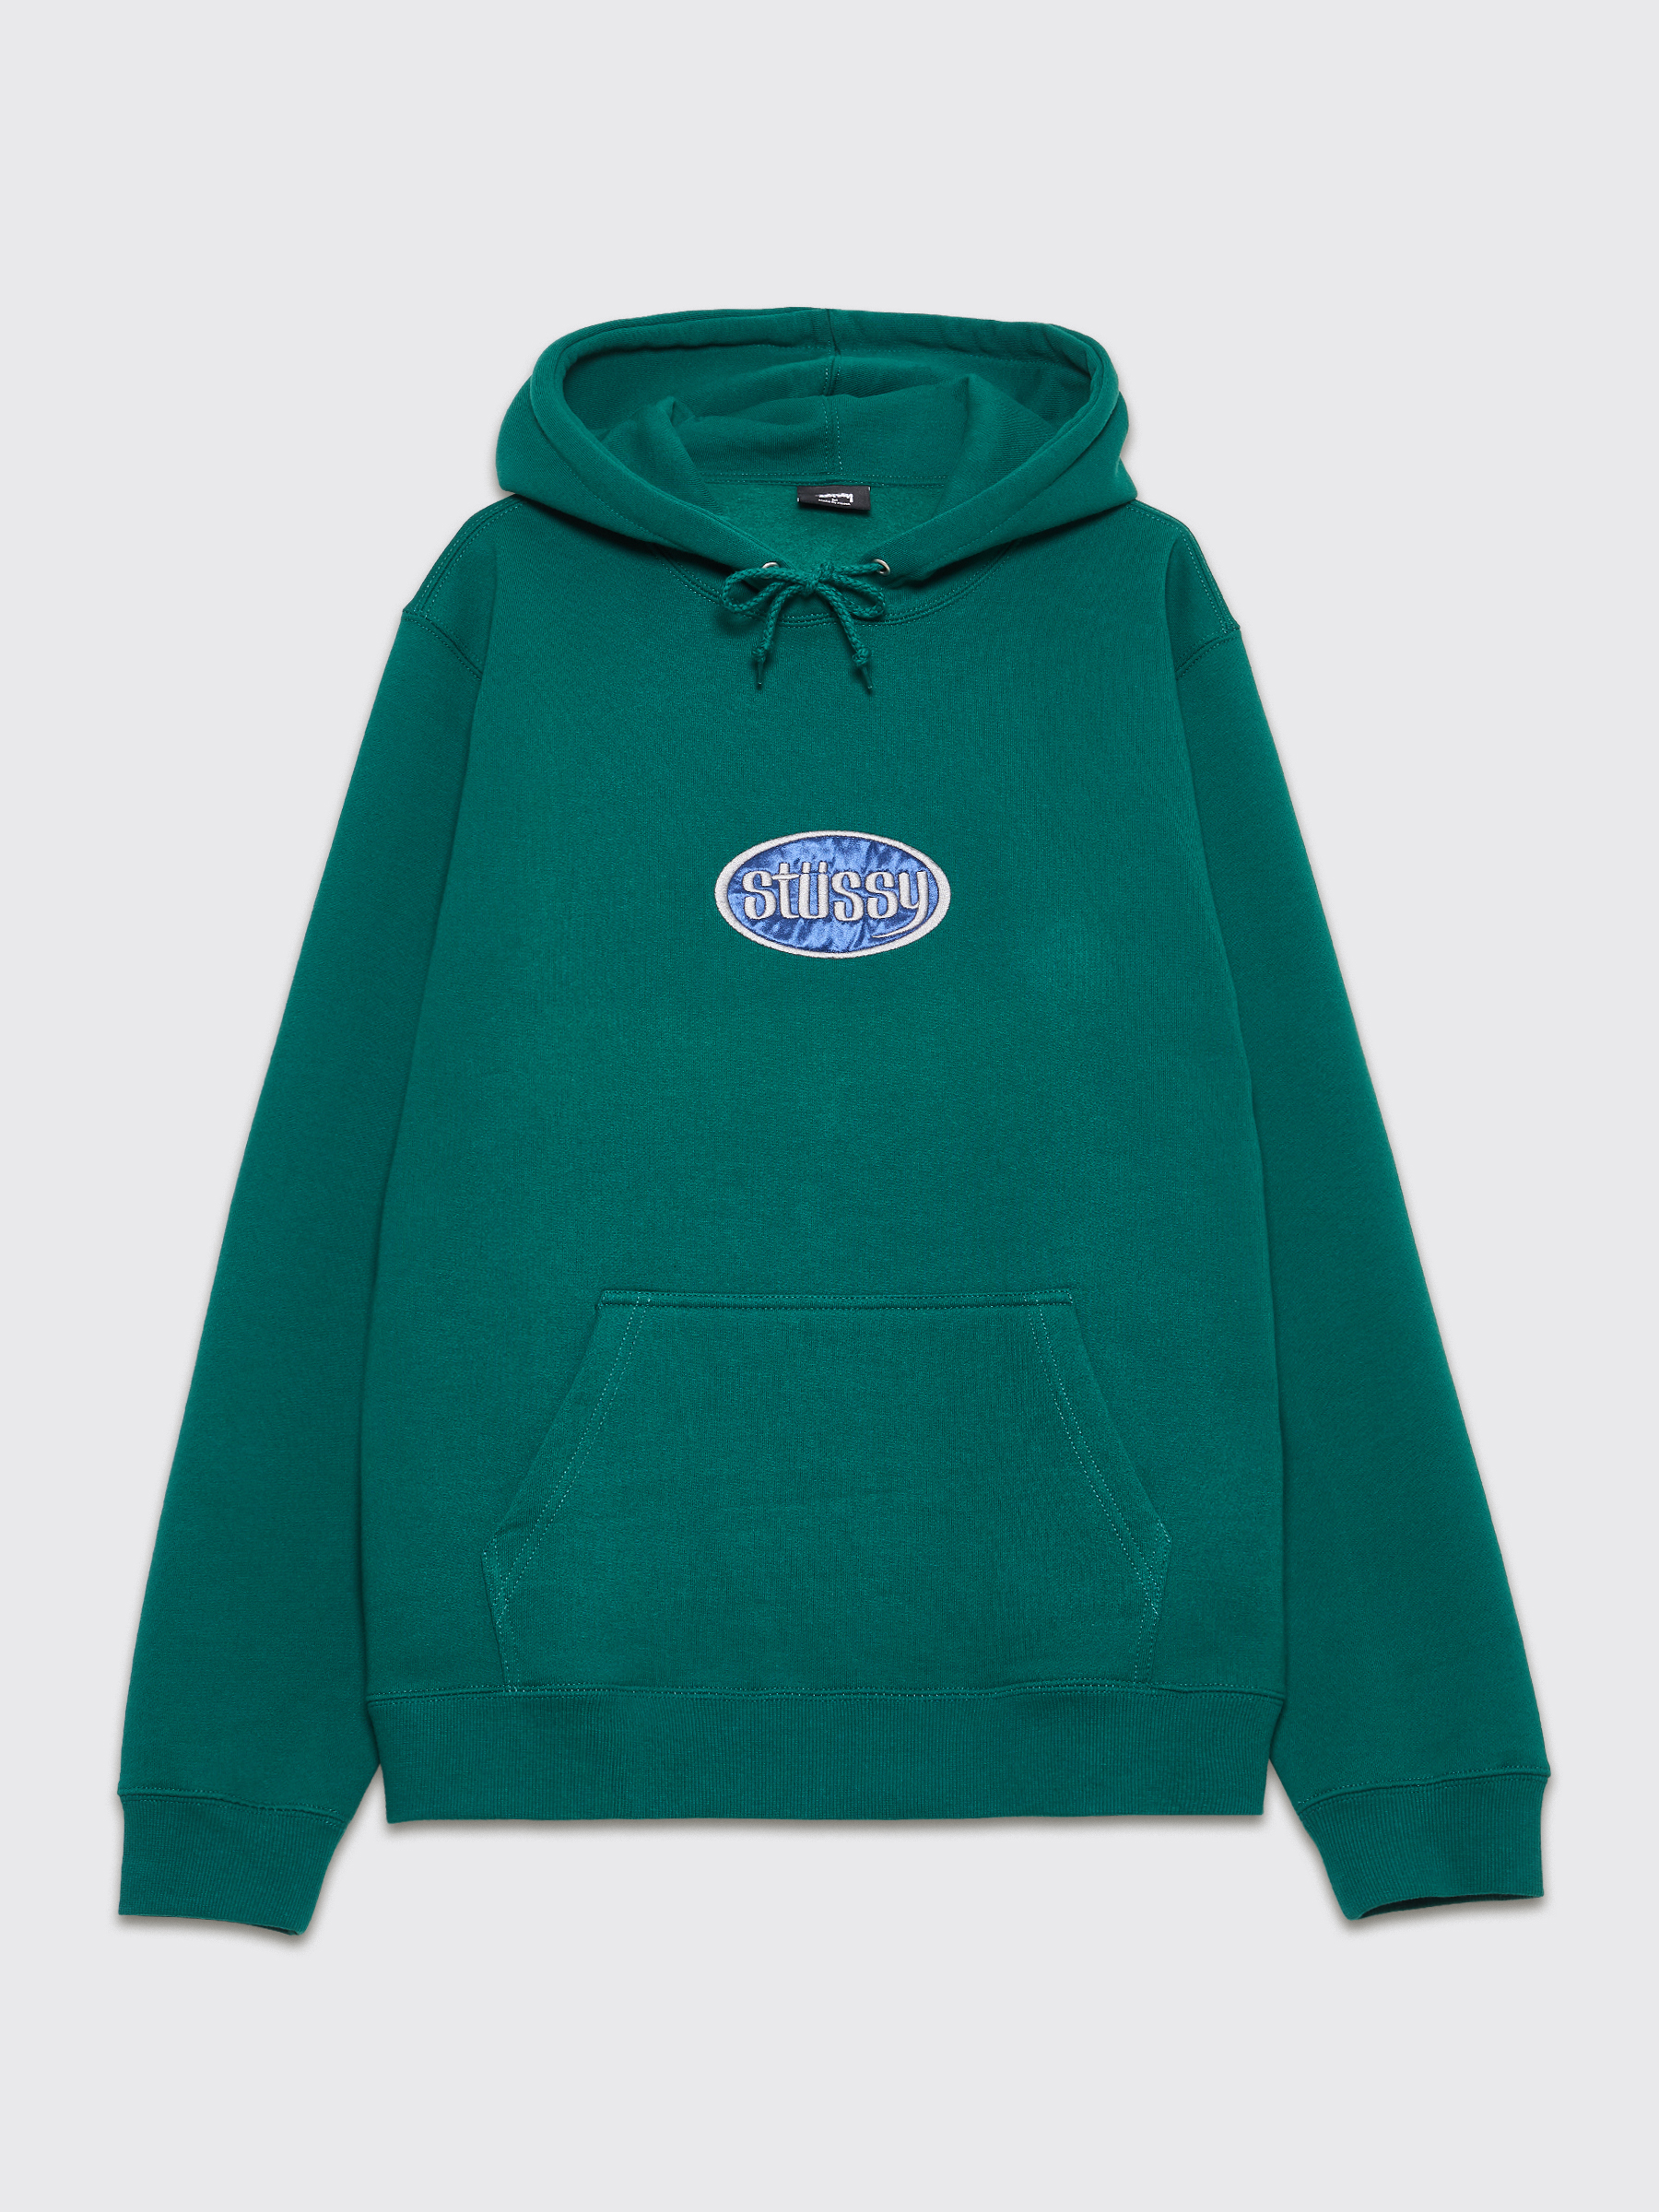 8b4f5b9281 Stüssy Hooded Sweatshirt Oval Applique Green